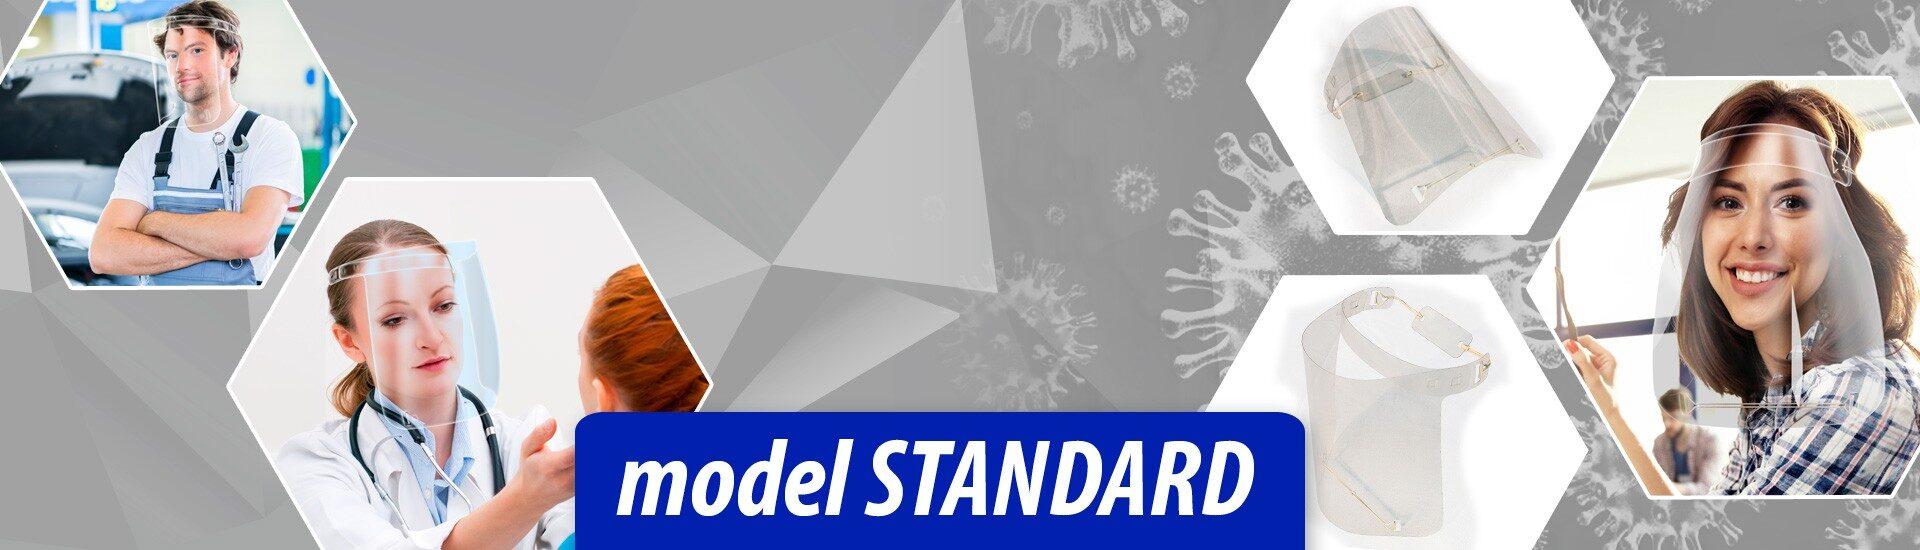 Model STANDARD